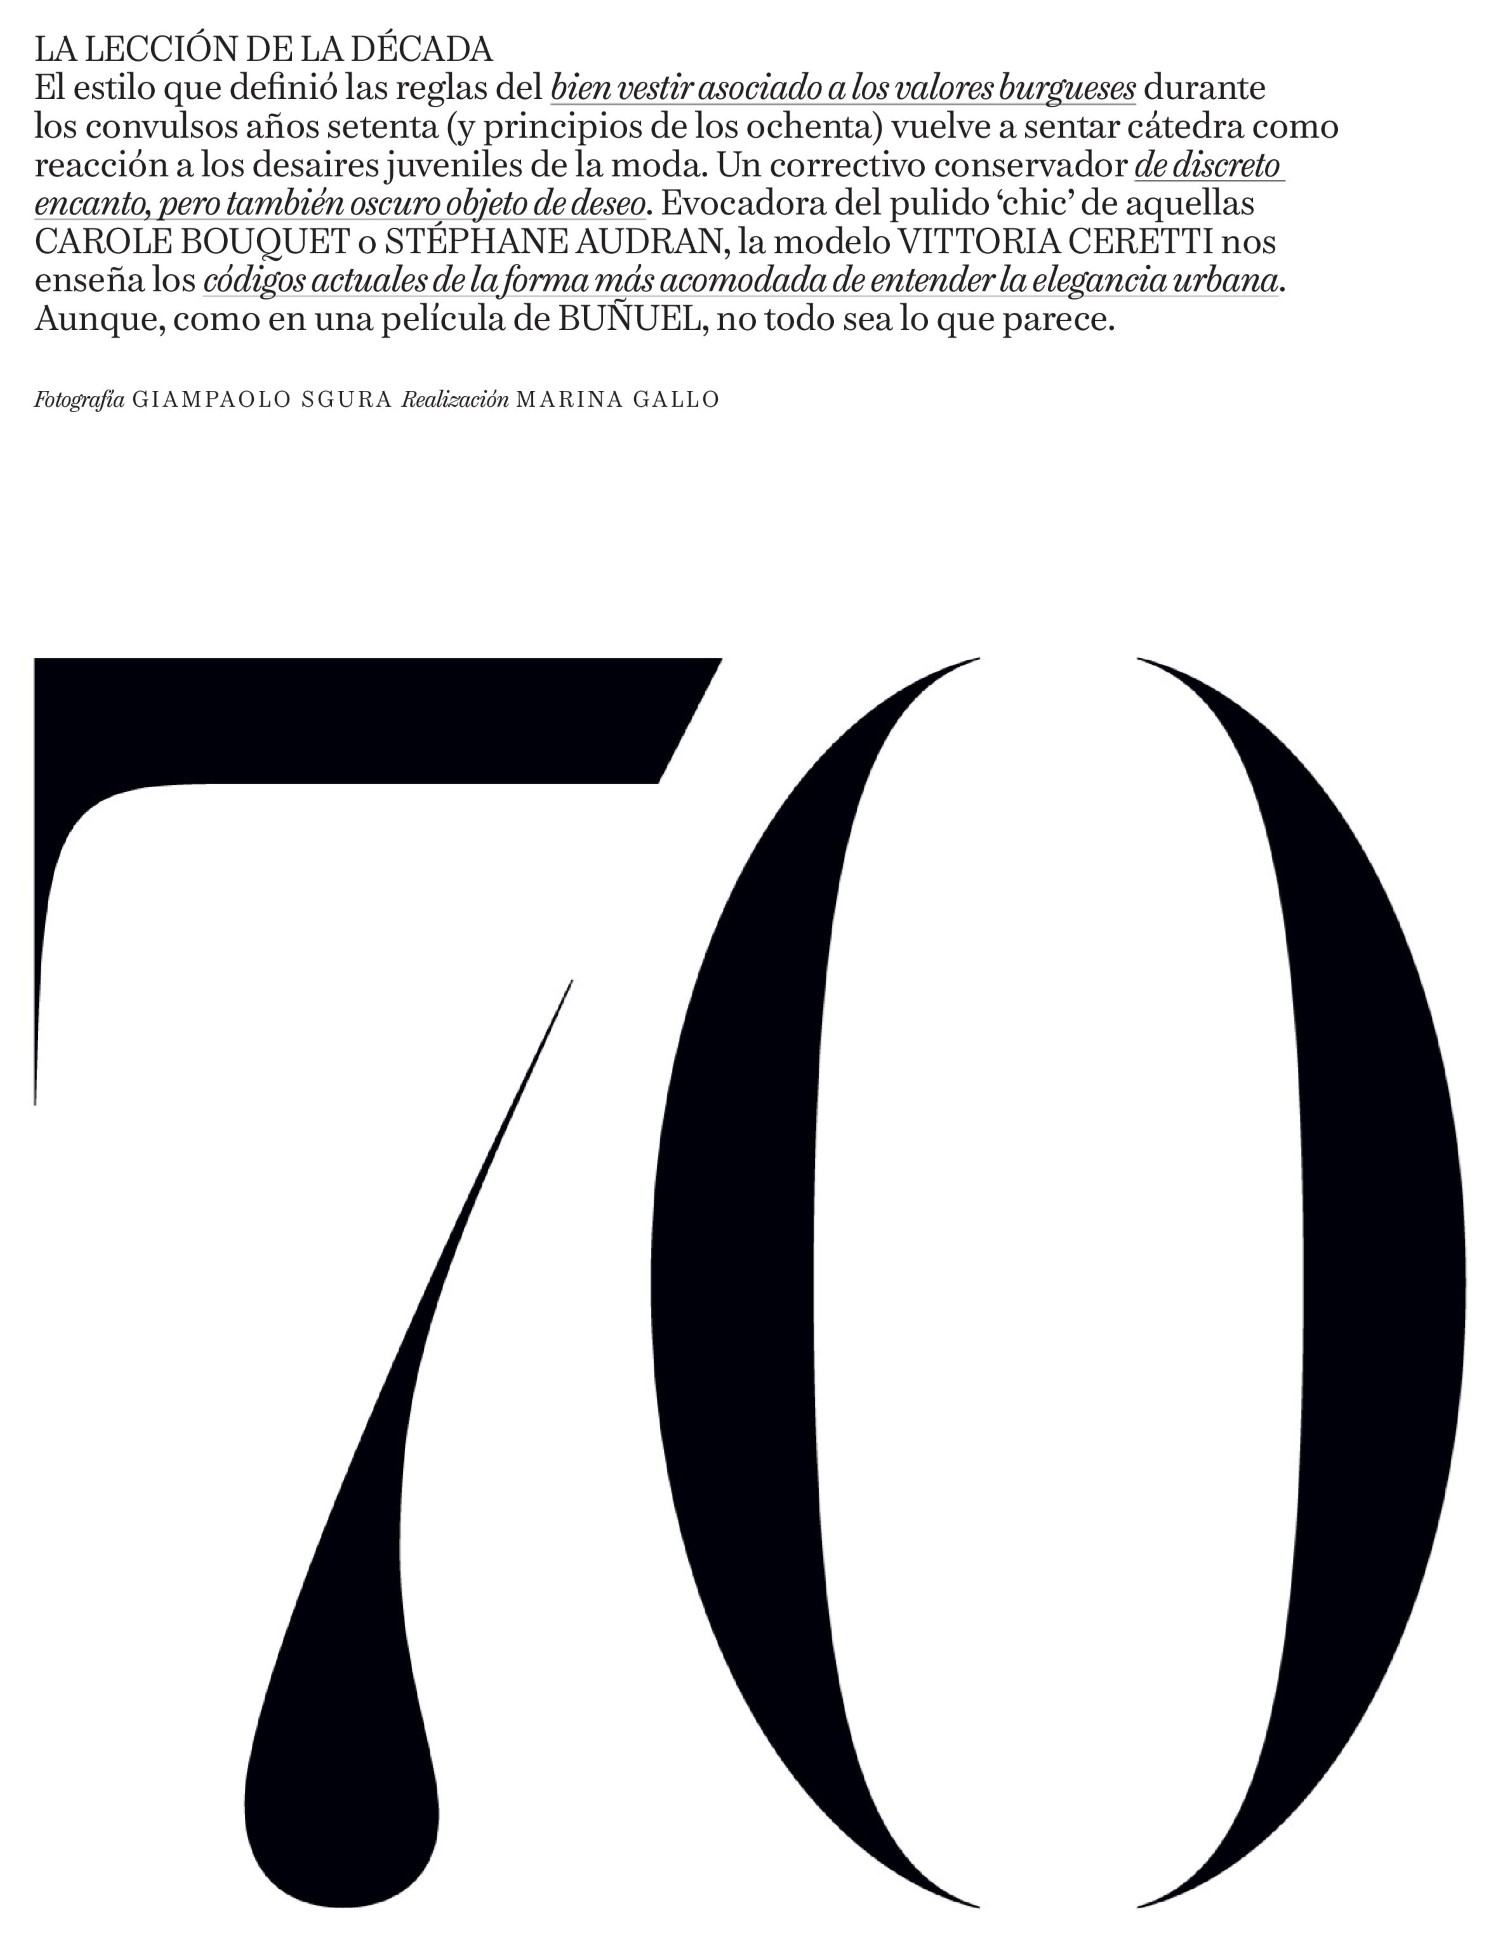 Vittoria Ceretti by Giampaolo Sgura for Vogue Paris Sept 2019 (2).jpg